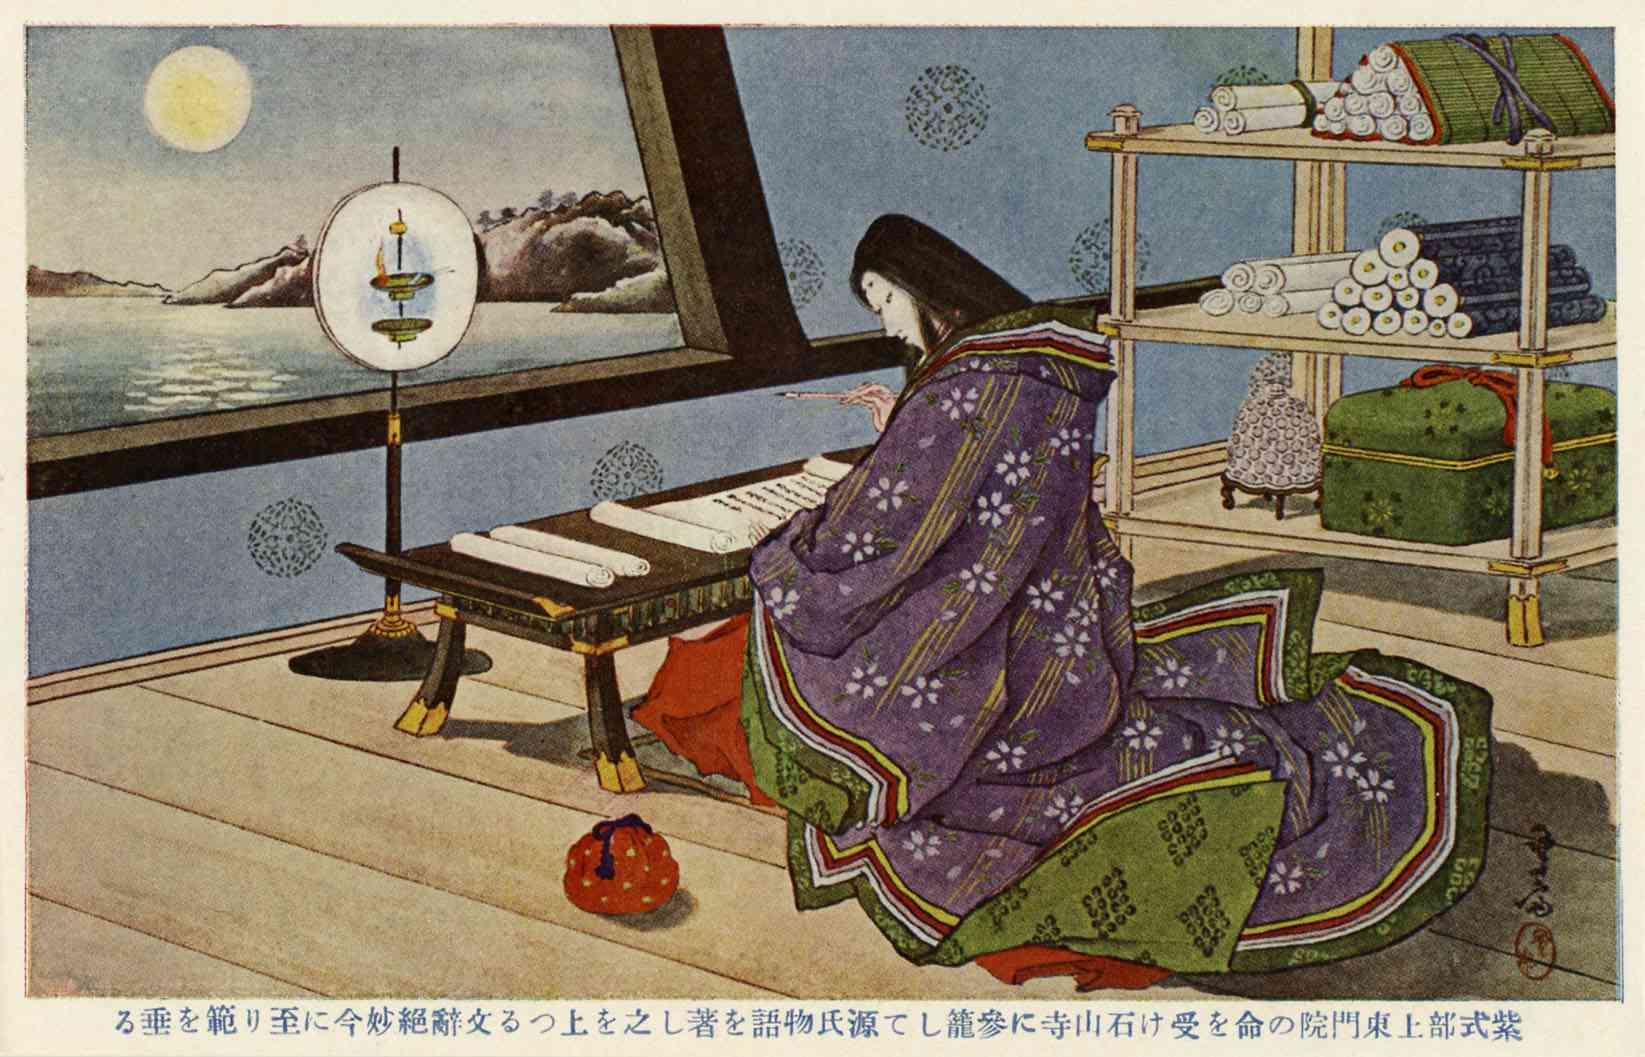 Lady Murasaki writing Tale of Genji